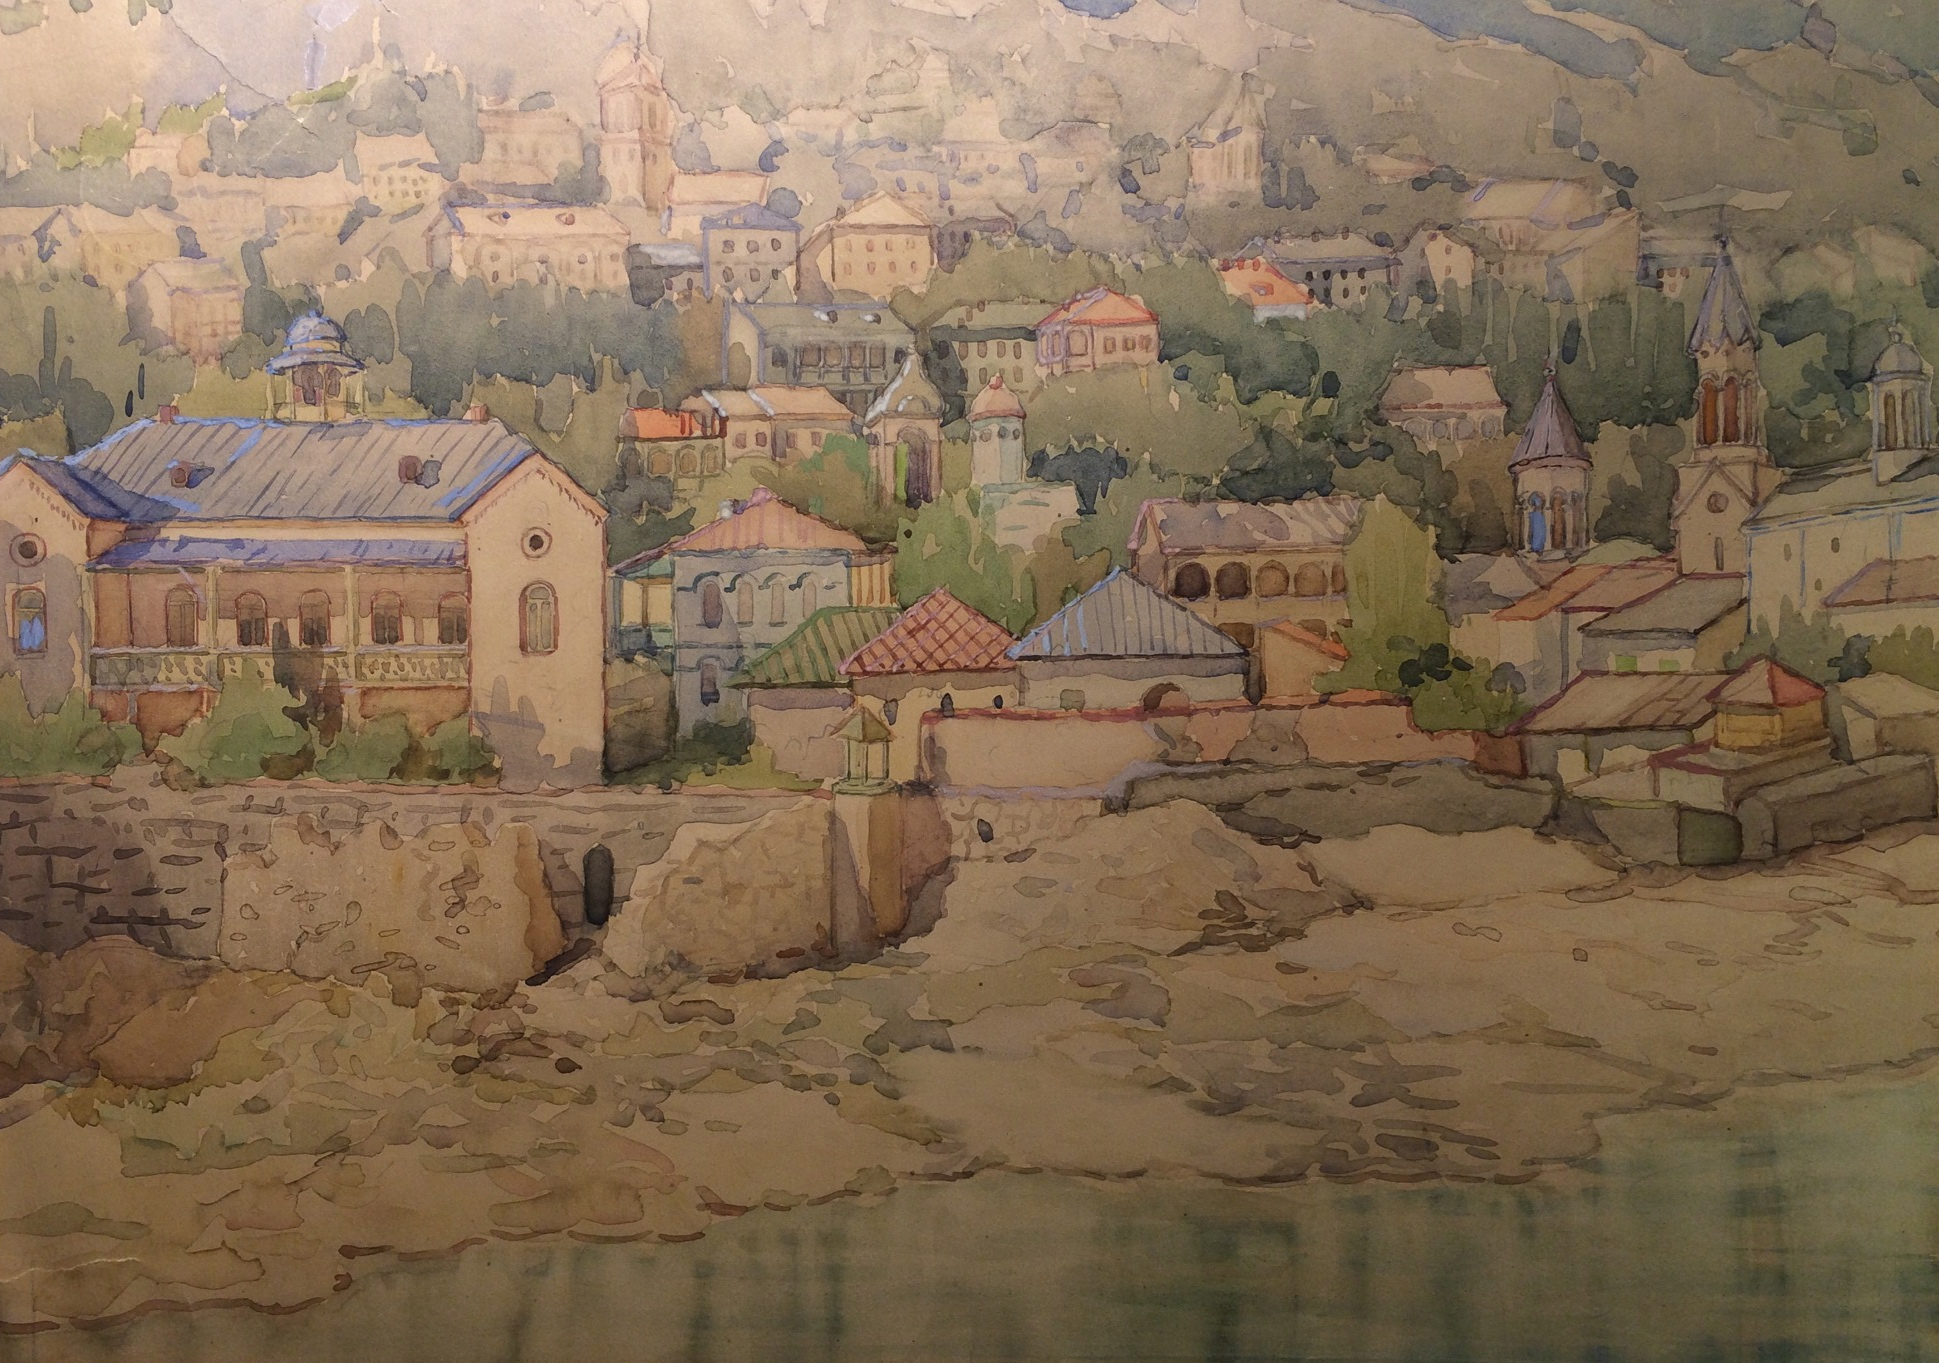 Джапаридзе Вахтанг Ношреванович. Старая часть Тбилиси.